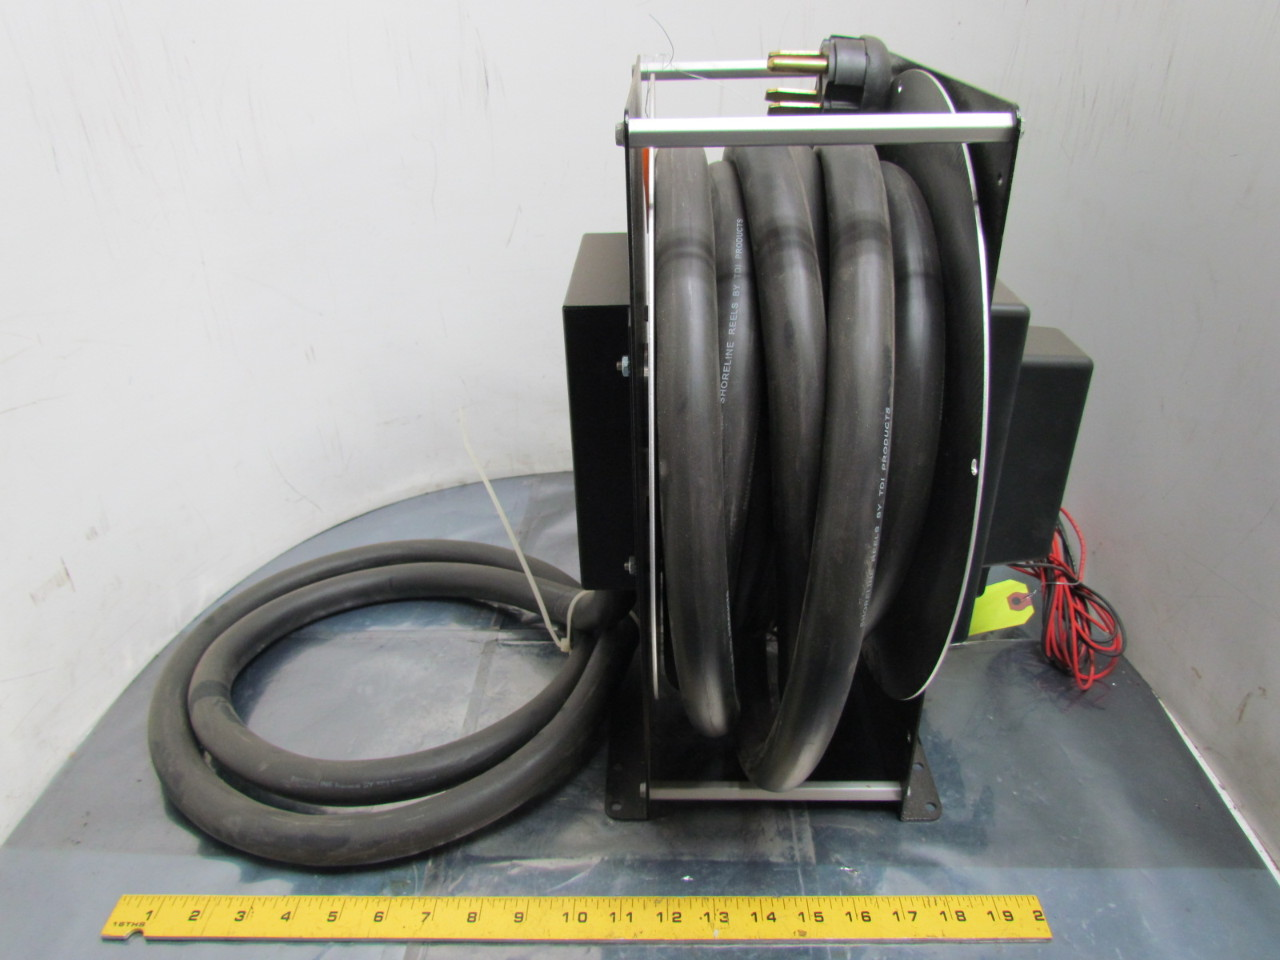 4 prong twist lock plug wiring diagram polaris 90 50a rv wiring, 50a, free engine image for user manual download